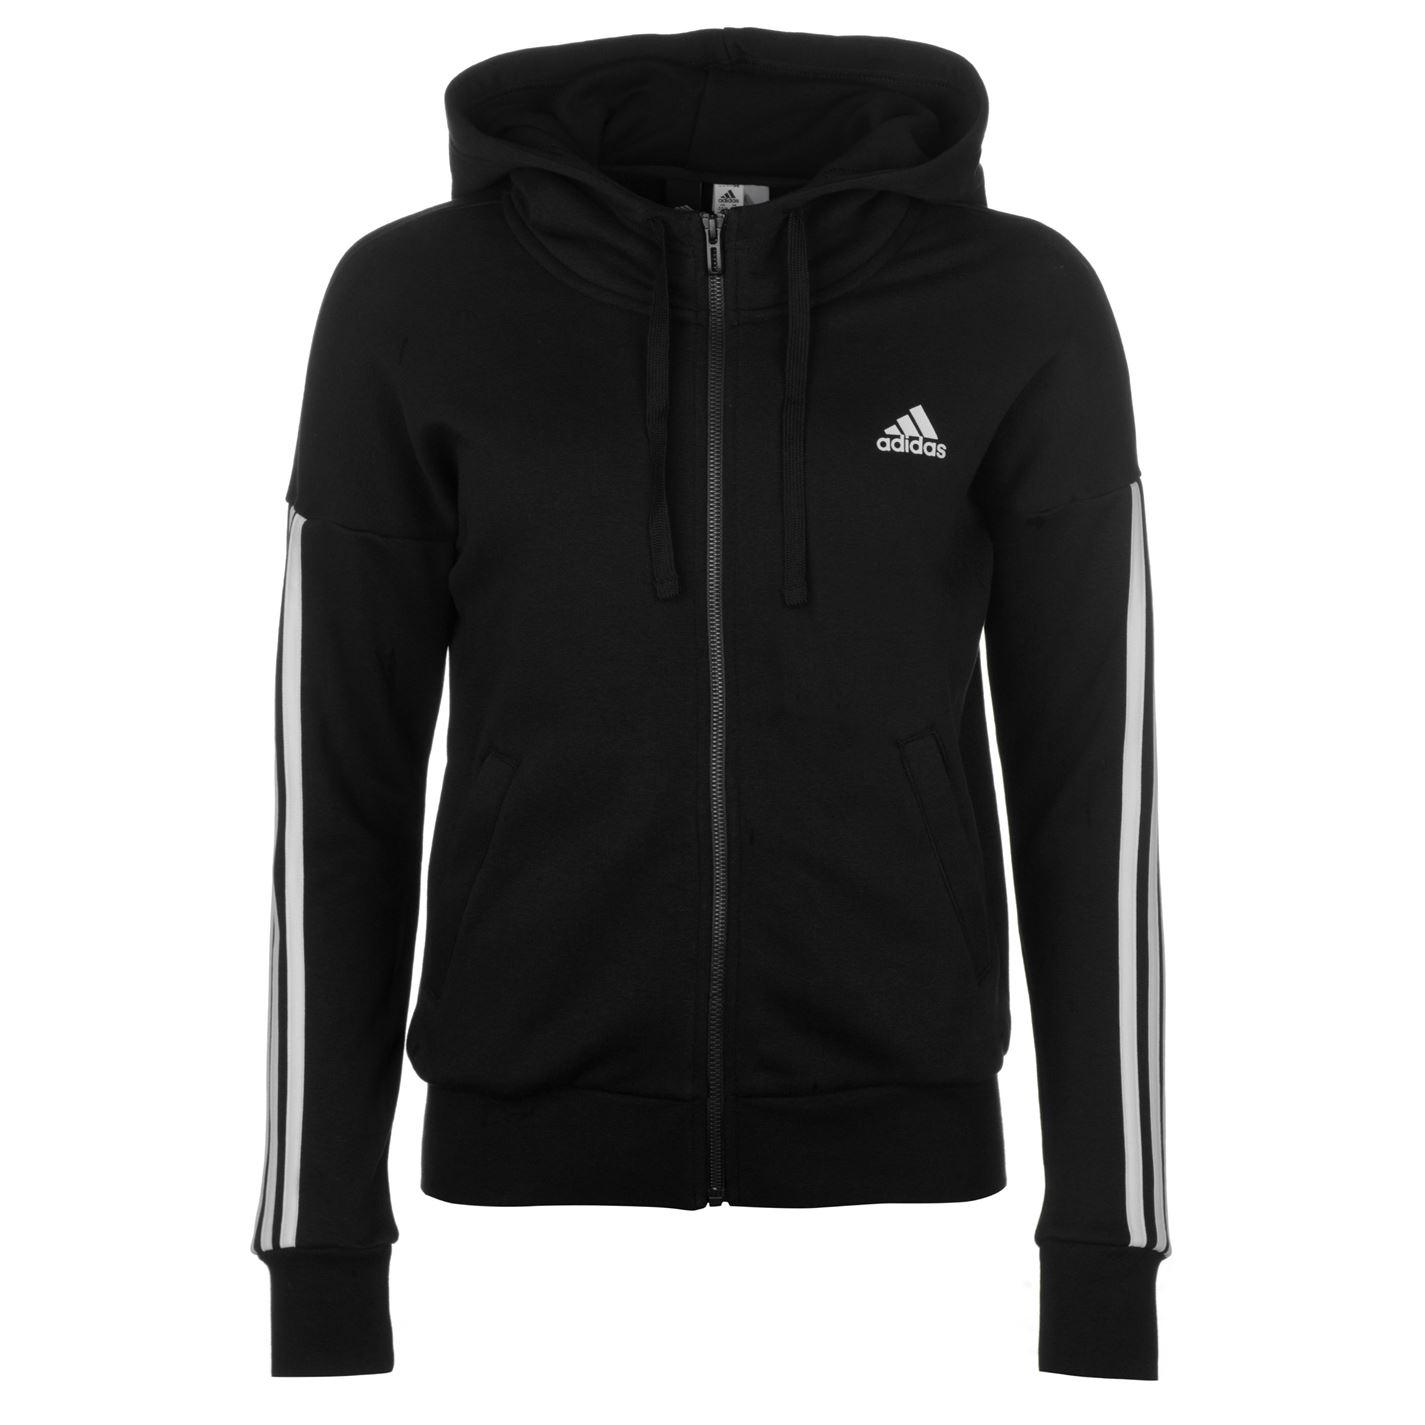 Adidas Essentials 3 Stripe Womens Hoodie